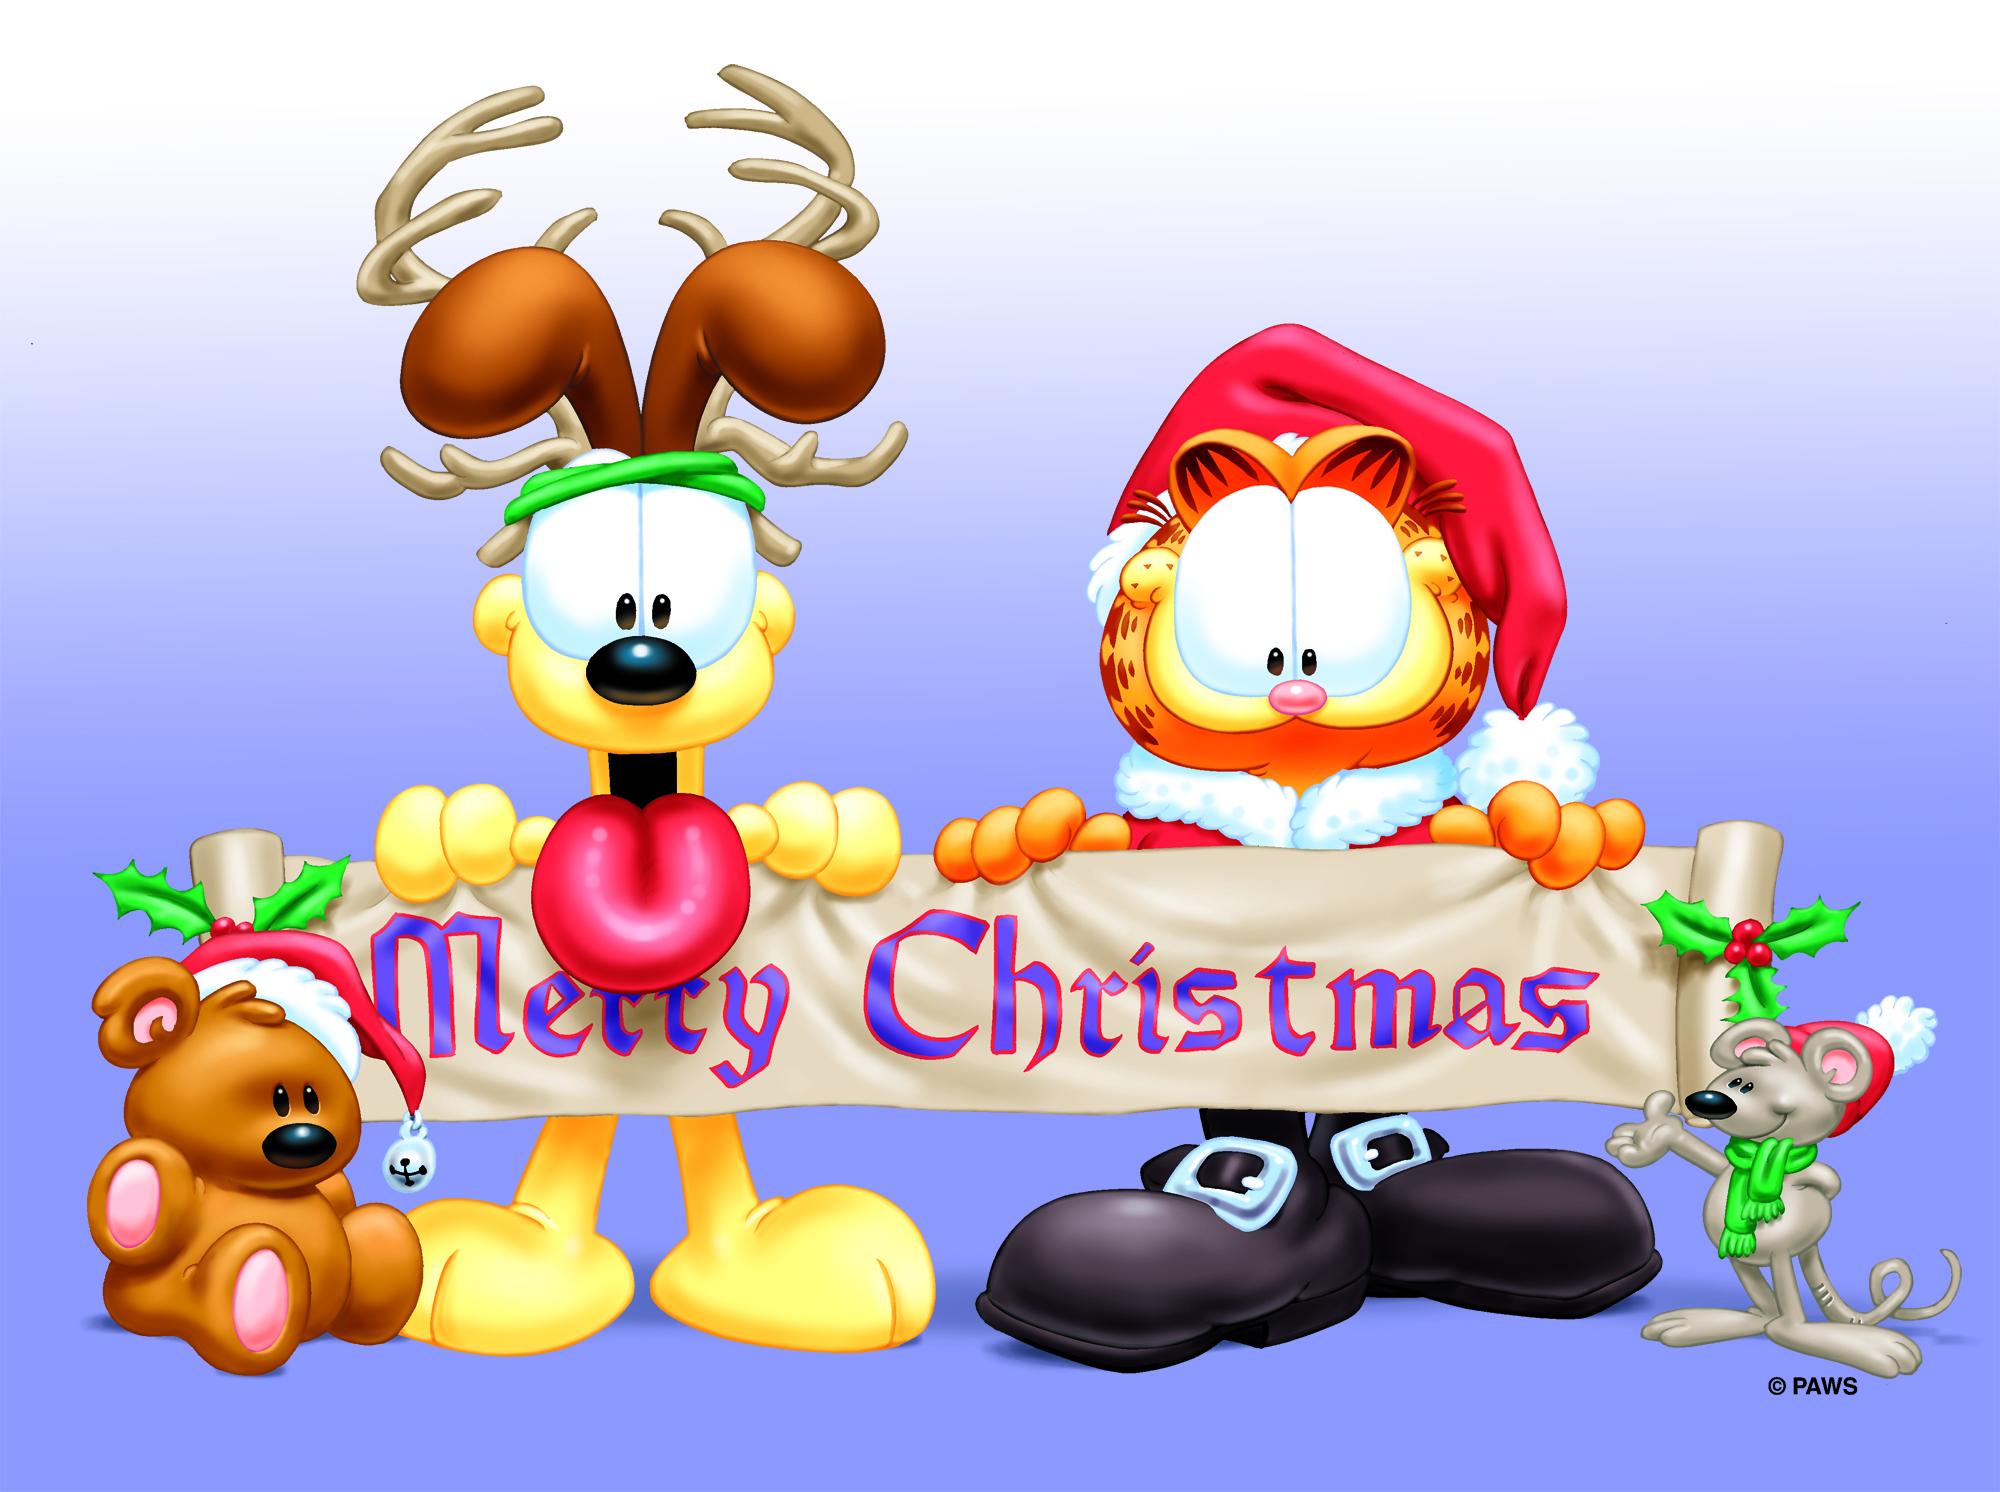 Garfield Christmas.Milestone Events Announce A Garfield Christmas National